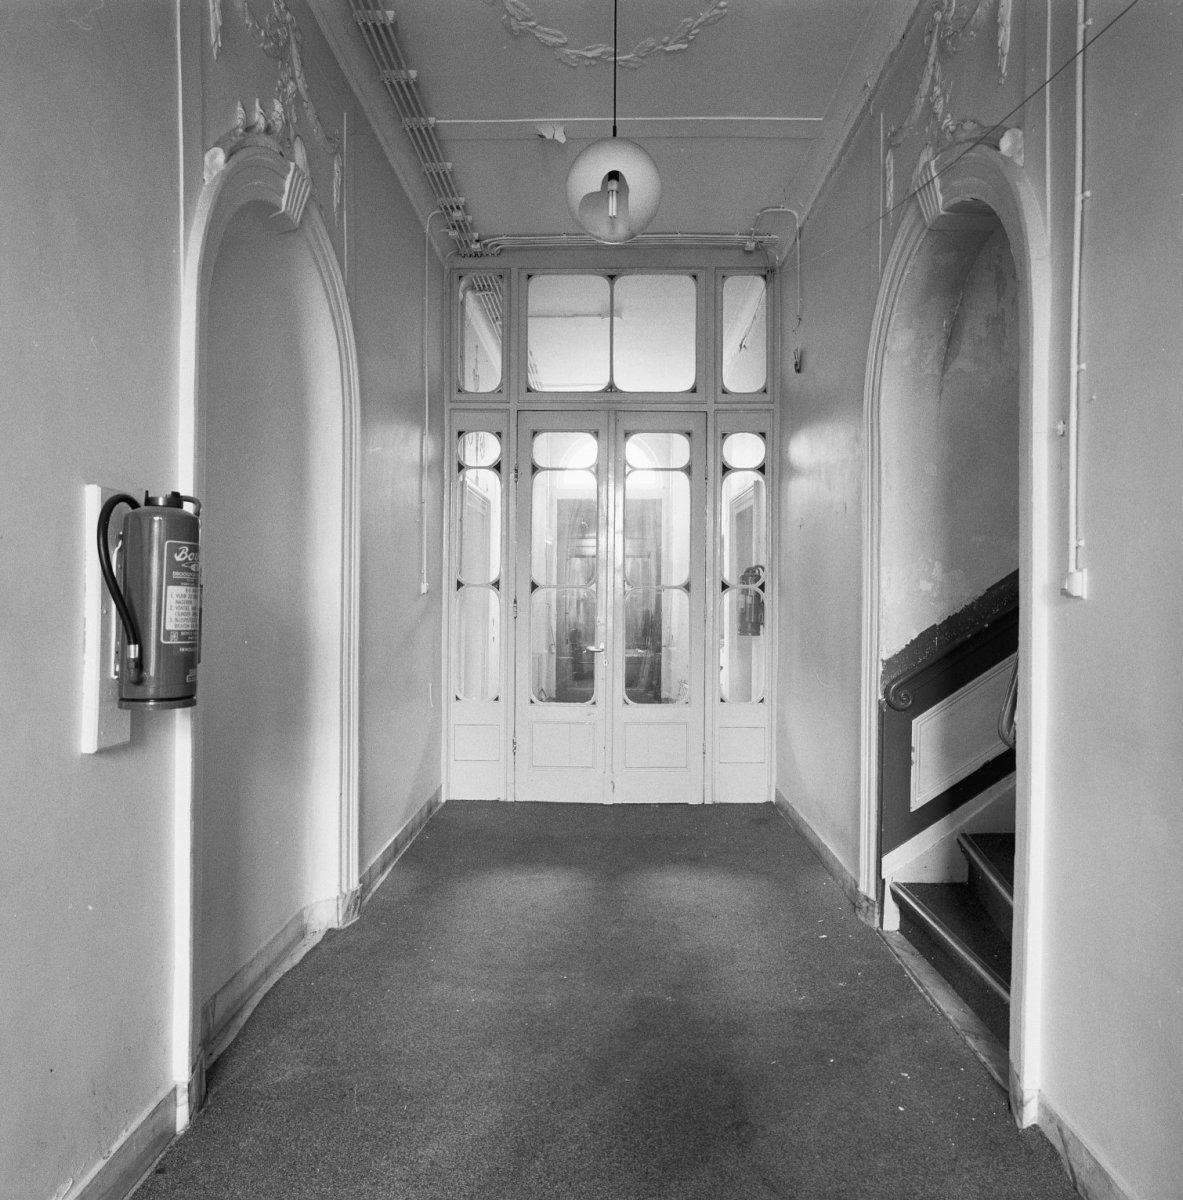 File interieur gang met tussendeur richting voorzijde rechts trap opgang links nis in de - Gang decoratie met trap ...